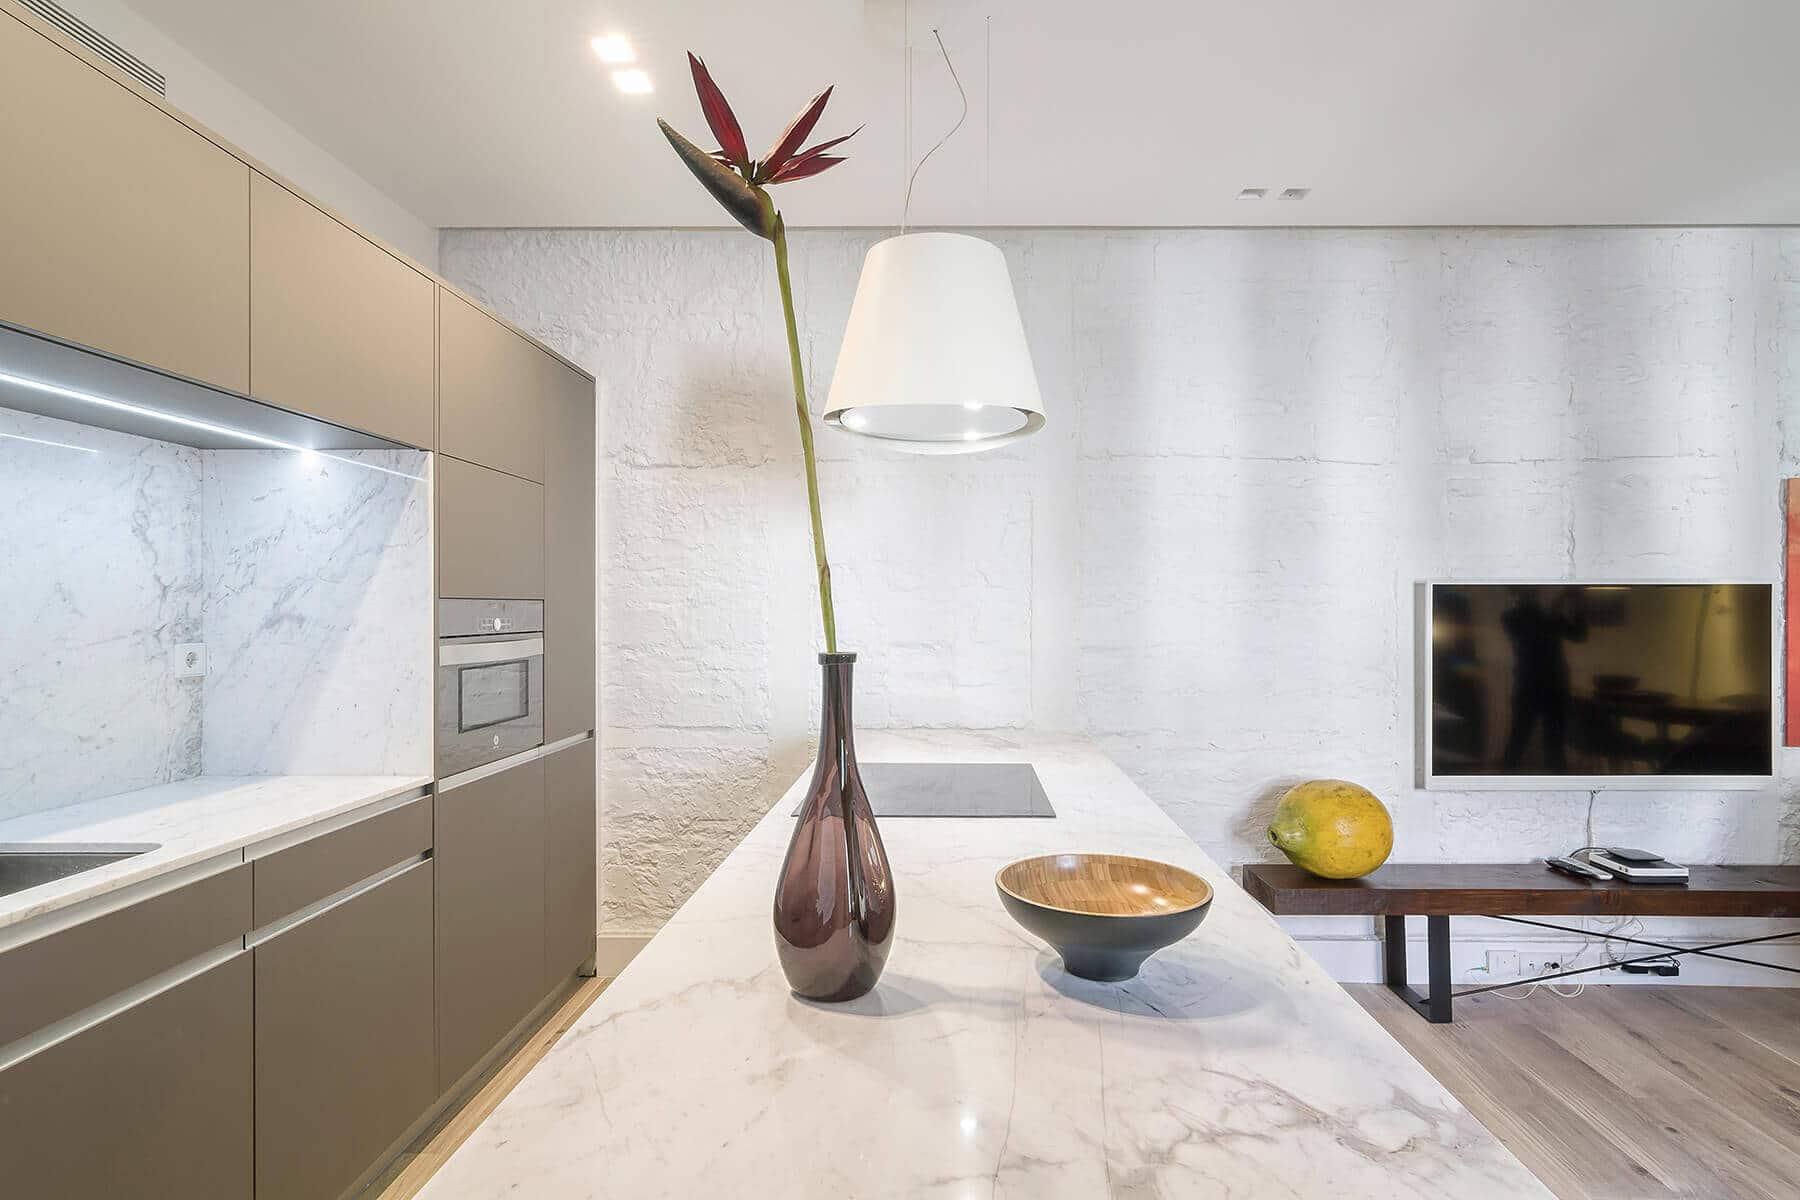 Espectacular cocina con península y campana de diseño con salón integrado